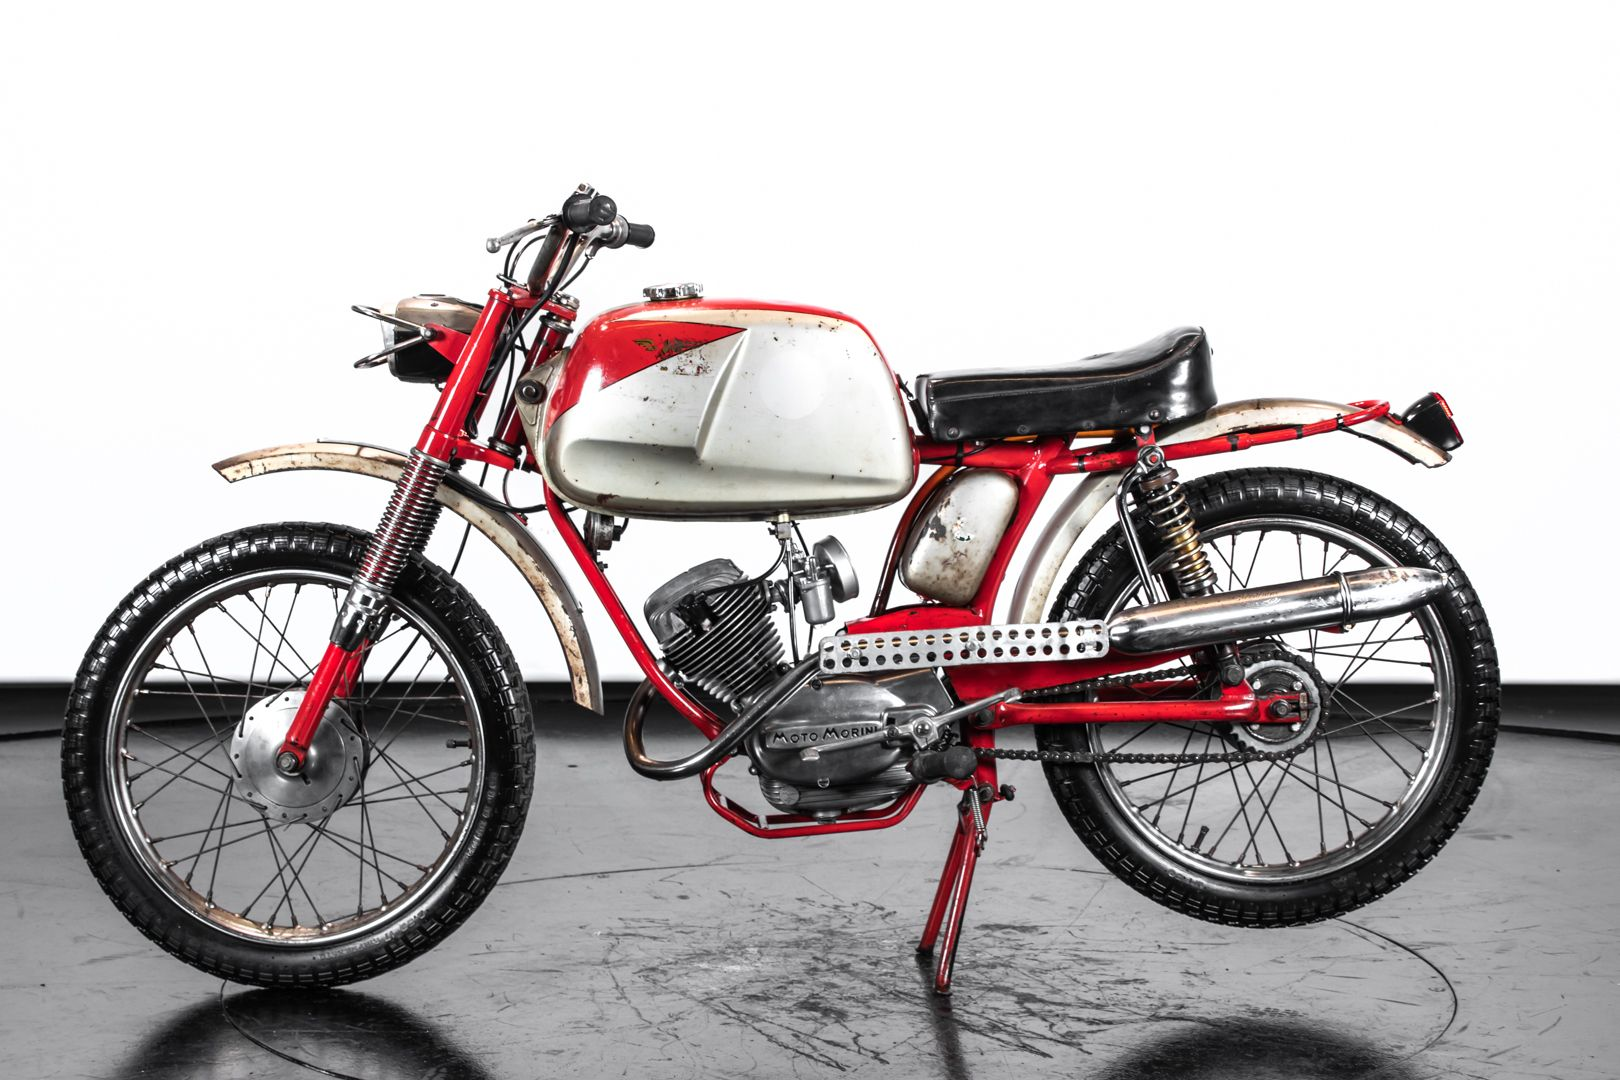 1967 Moto Morini Corsarino ZT Scrambler Tipo 1 77519